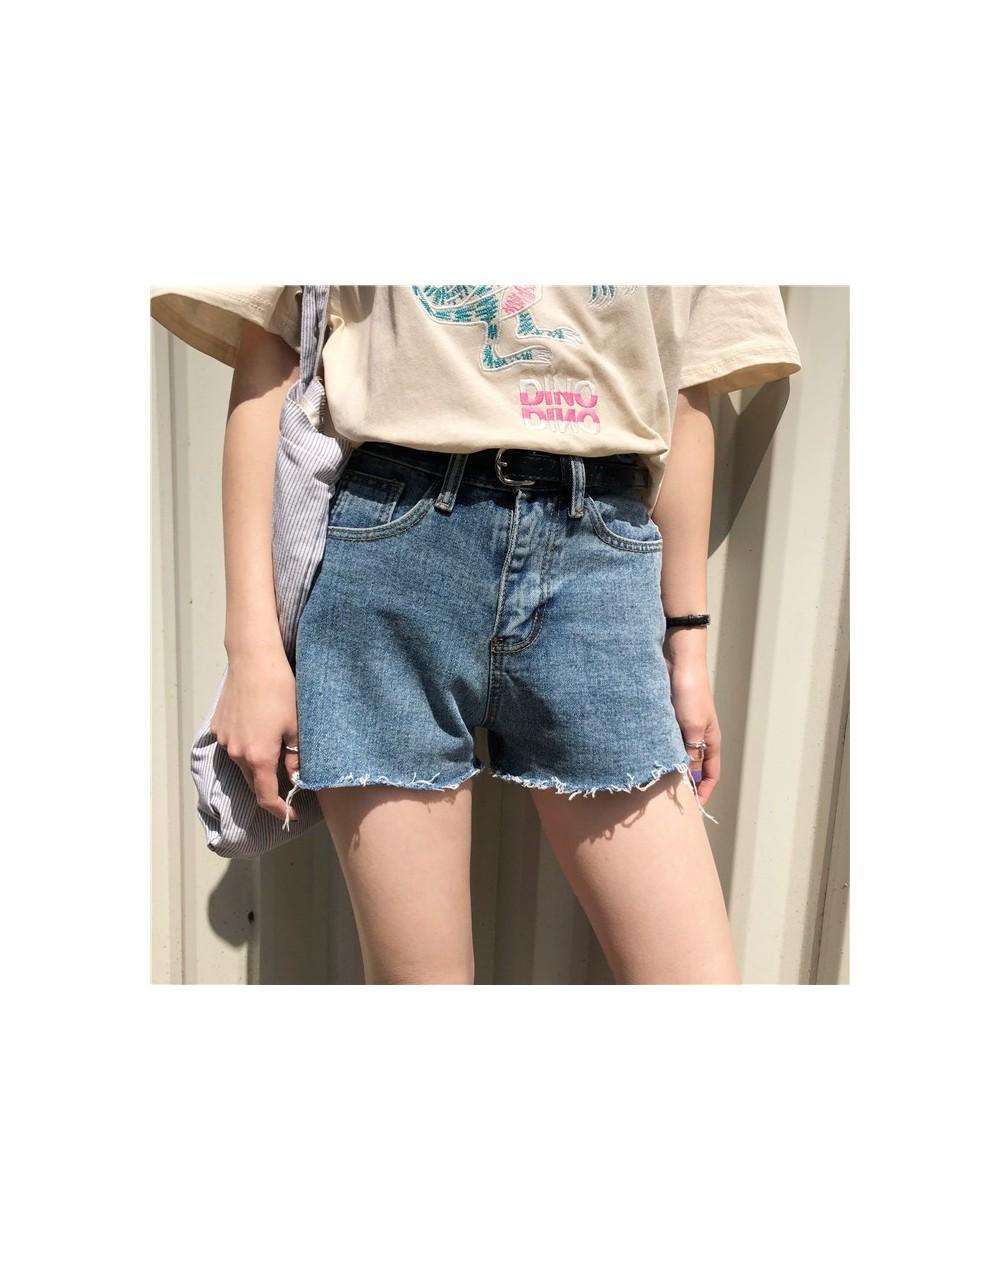 cotton jeans for lady summer casual short denim pants loose hem frayed side pockets three colors - Black - 433981037130-1